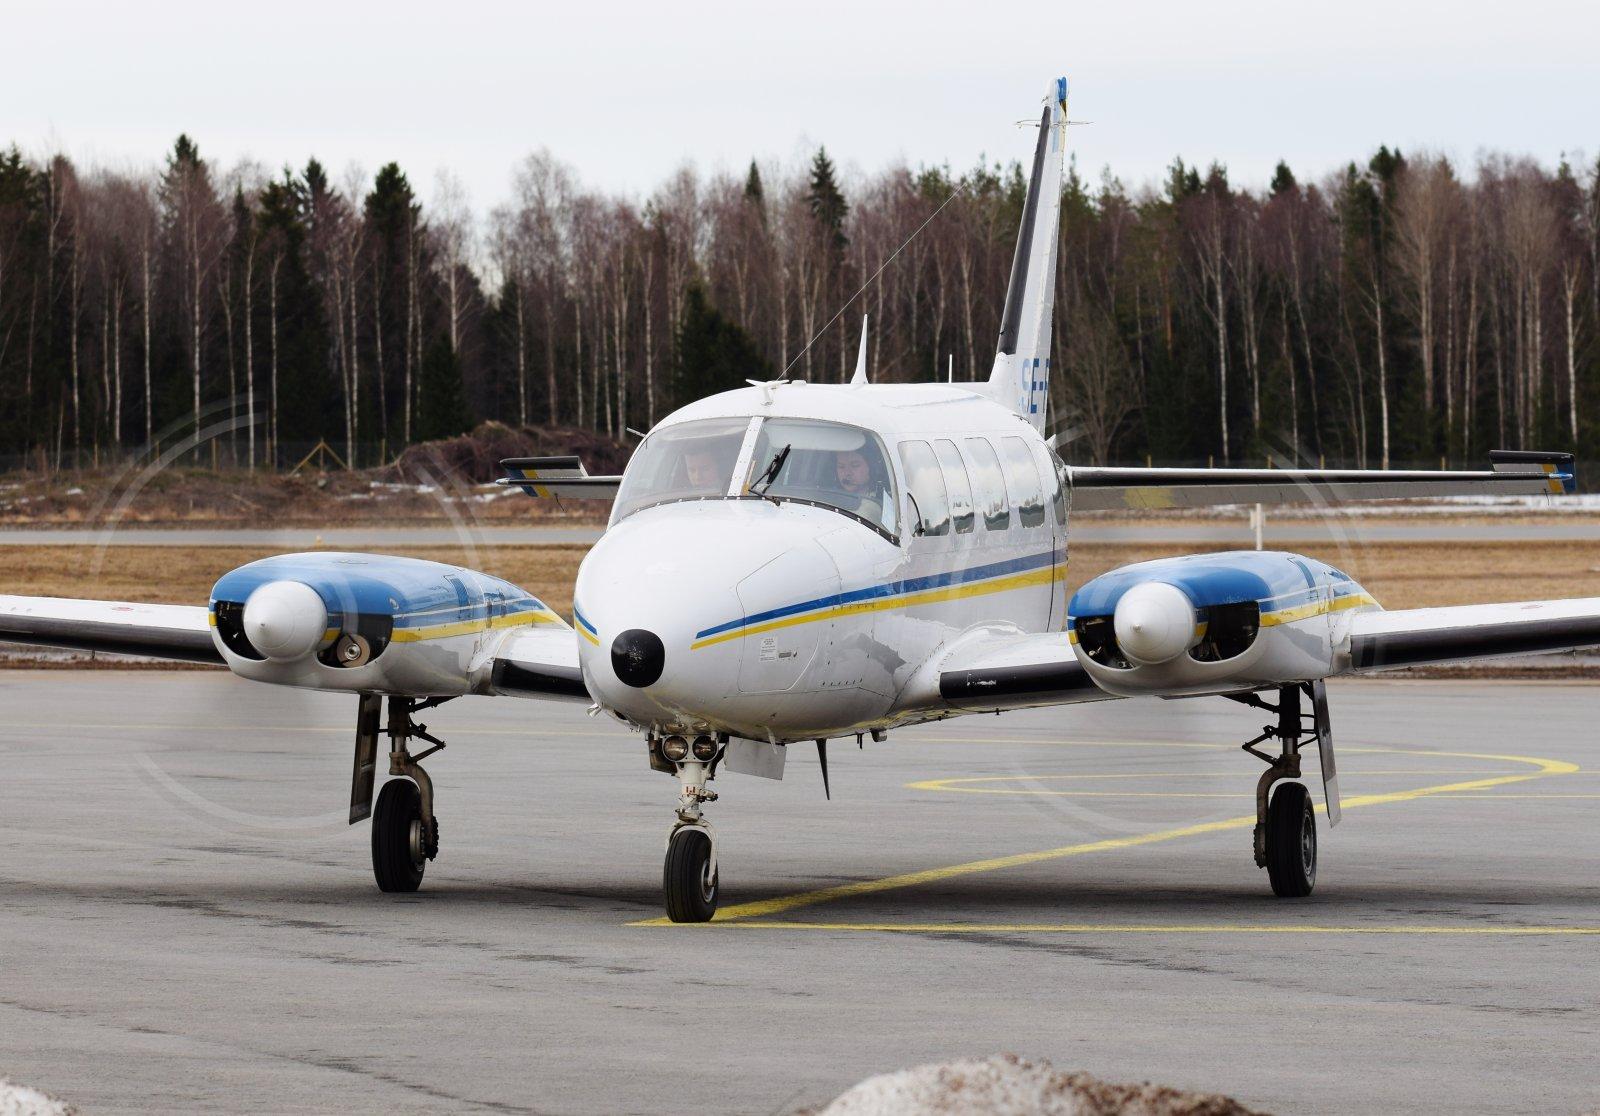 SE-FNE - Piper PA-31-350 Navajo Chieftain - Jonair - 28.3.2019